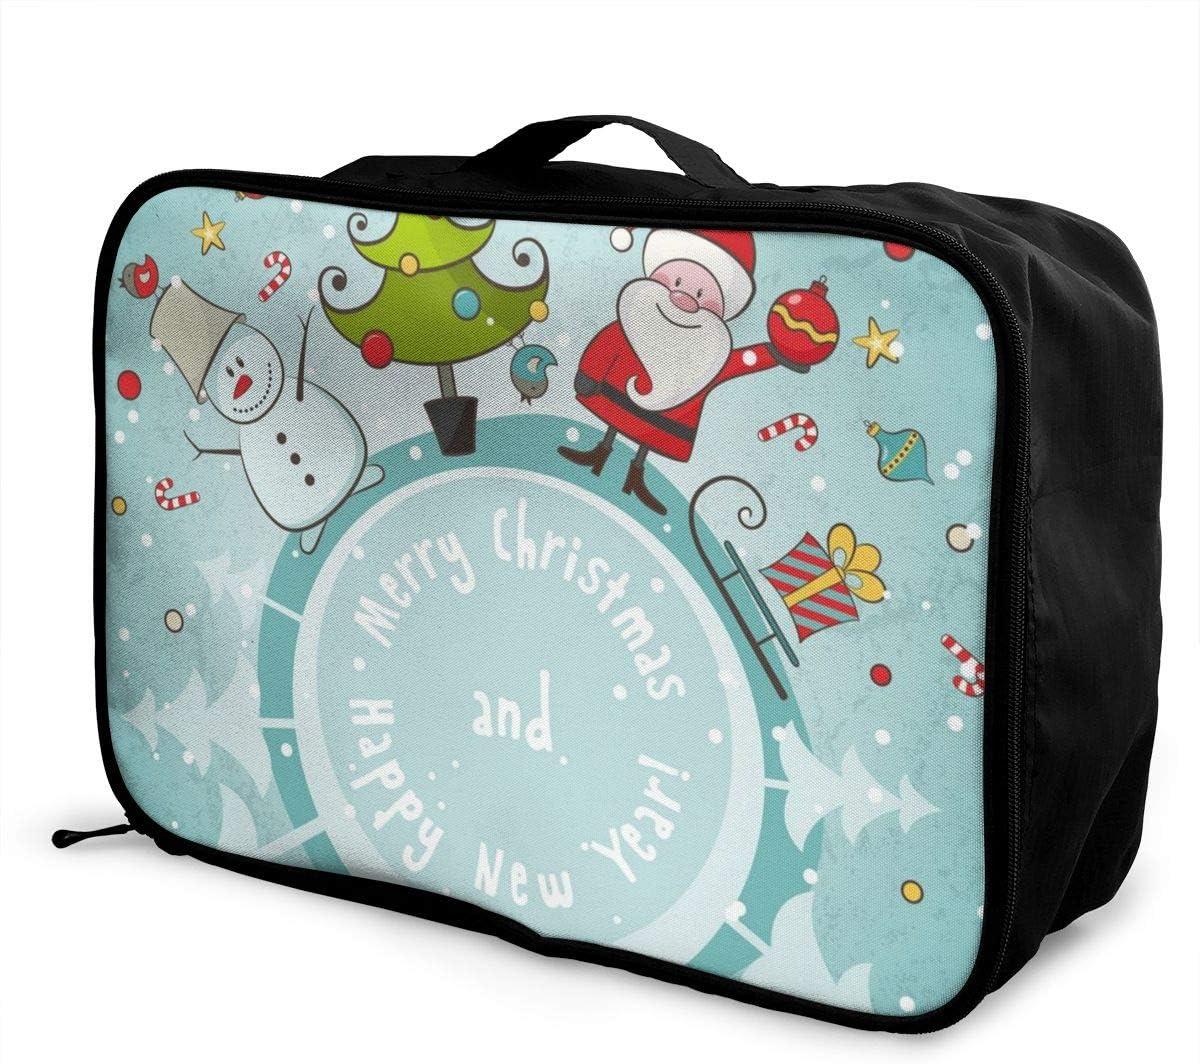 Yunshm Santa Claus Snowman Christmas Tree Holidays Customized Trolley Handbag Waterproof Unisex Large Capacity For Business Travel Storage